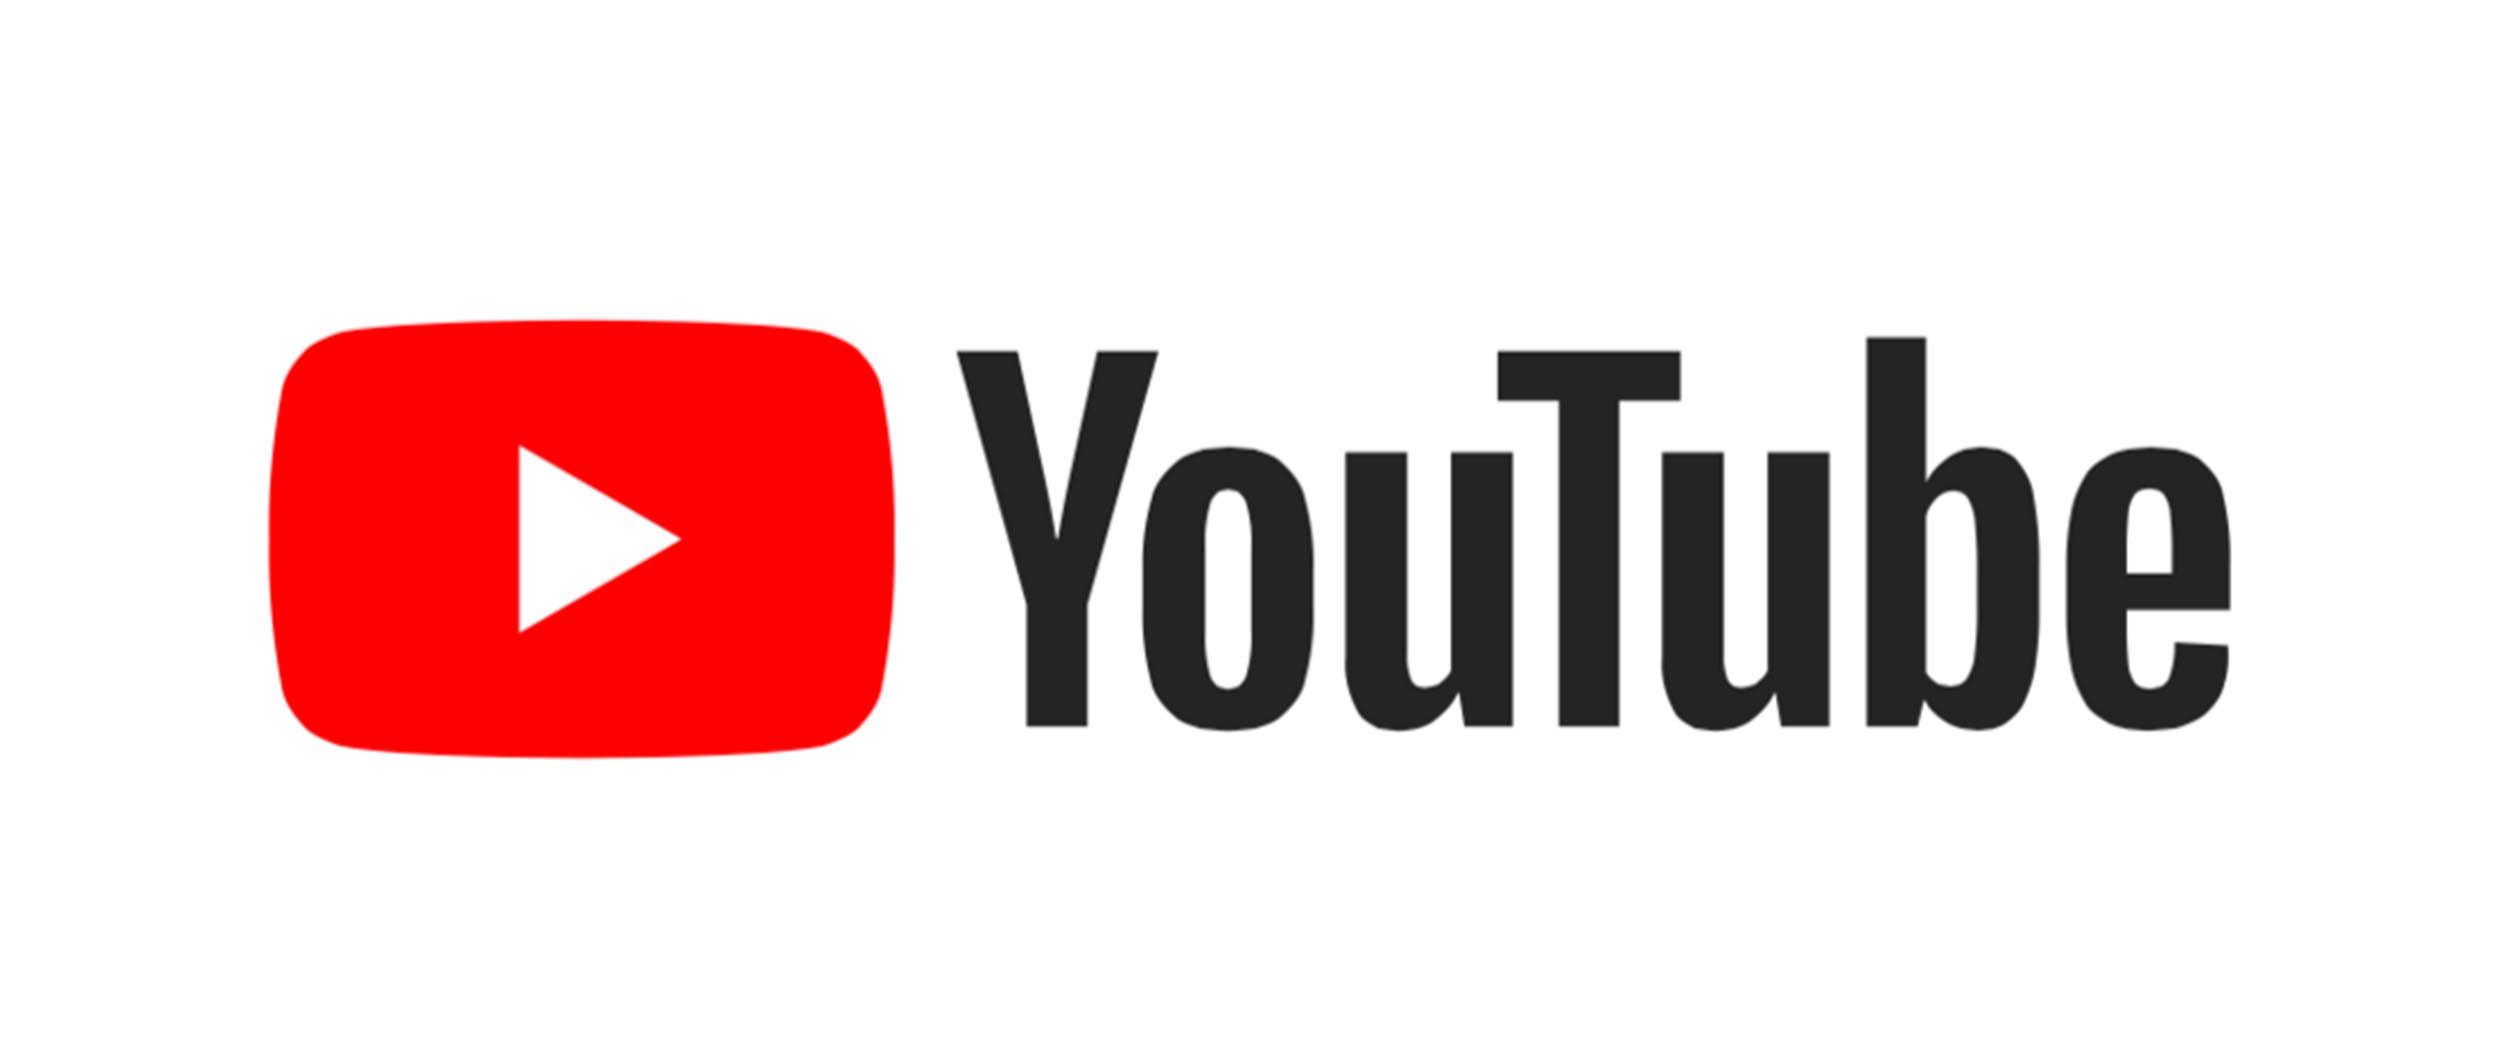 10 Youtube.jpg